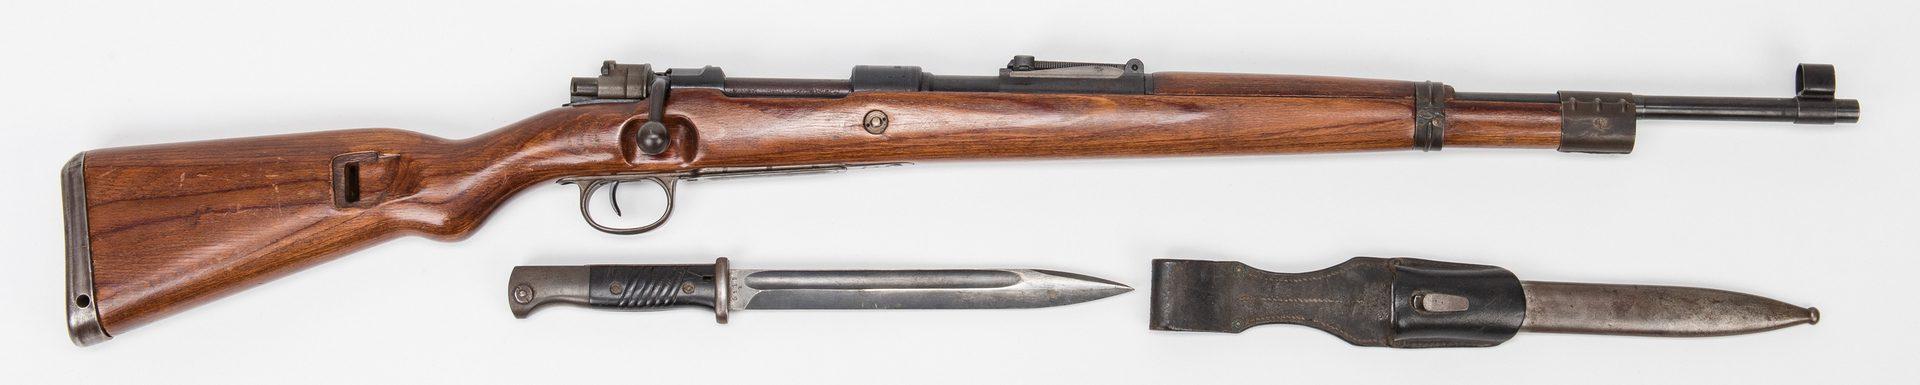 Lot 792: German Mauser Model 98 & German K98 Bayonet